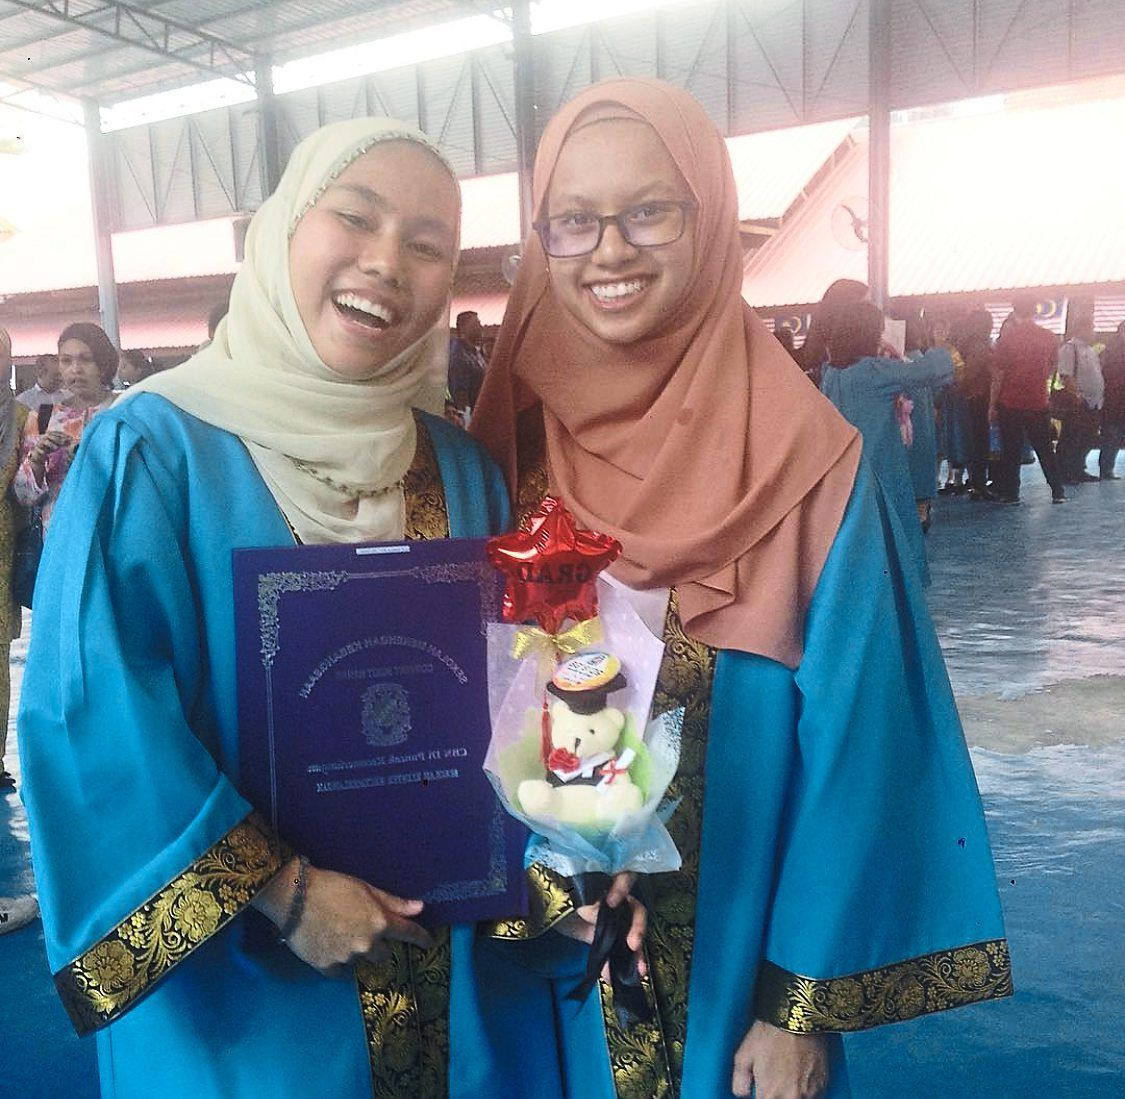 Buoyant spirits: Nurfatihah (right) and her friend Kamilia celebrating their graduation in 2018.